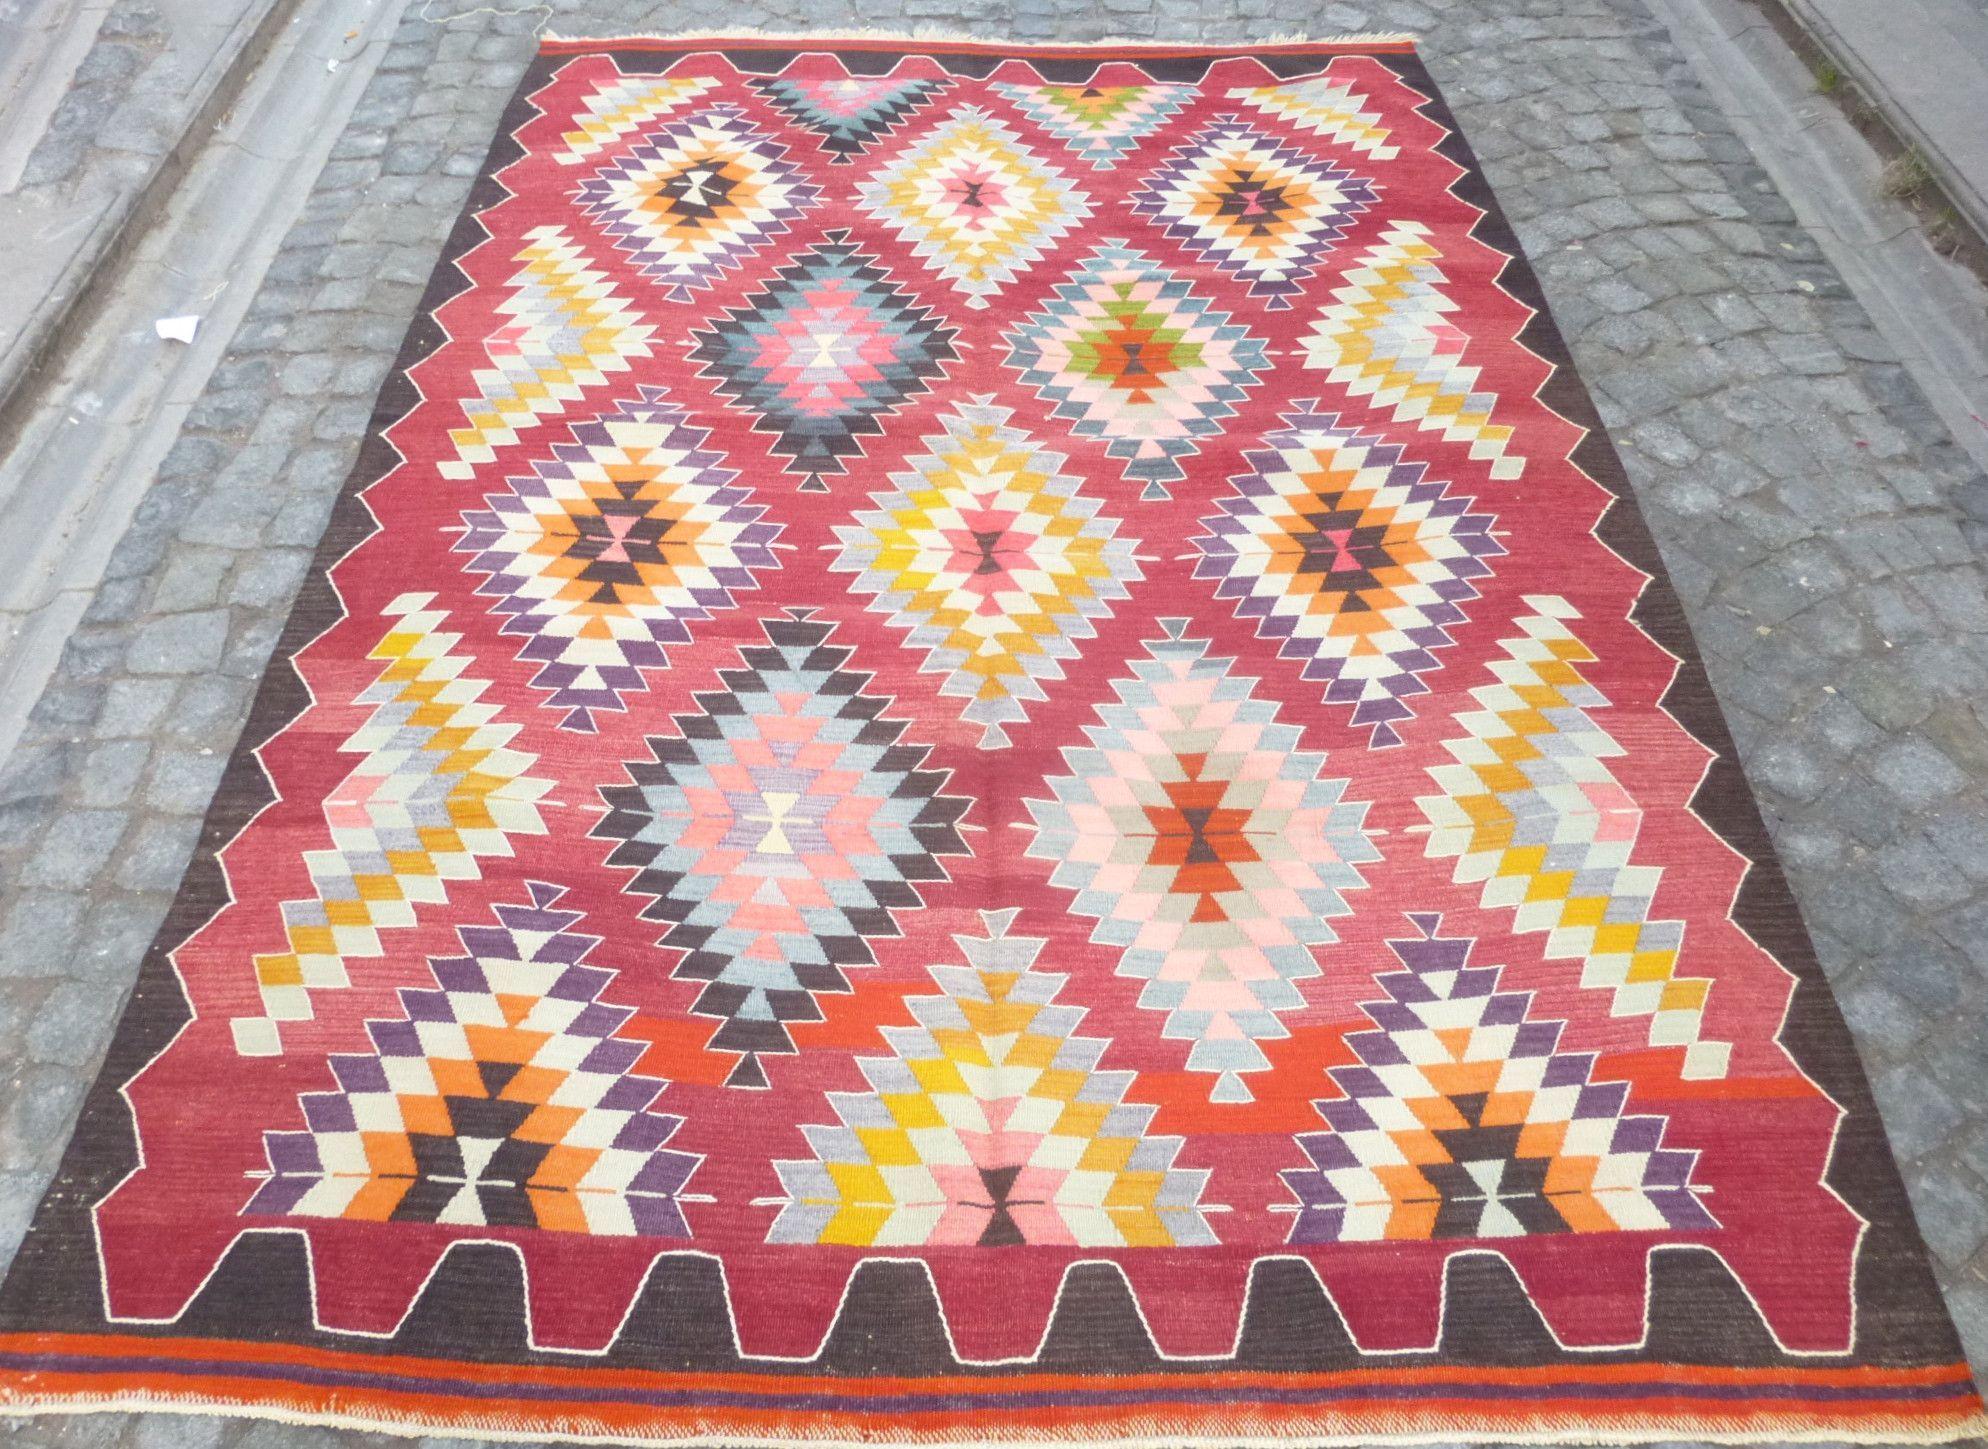 8,39 x 5,74 feet, Colorful Bohemian kilim rug with Diamond pattern